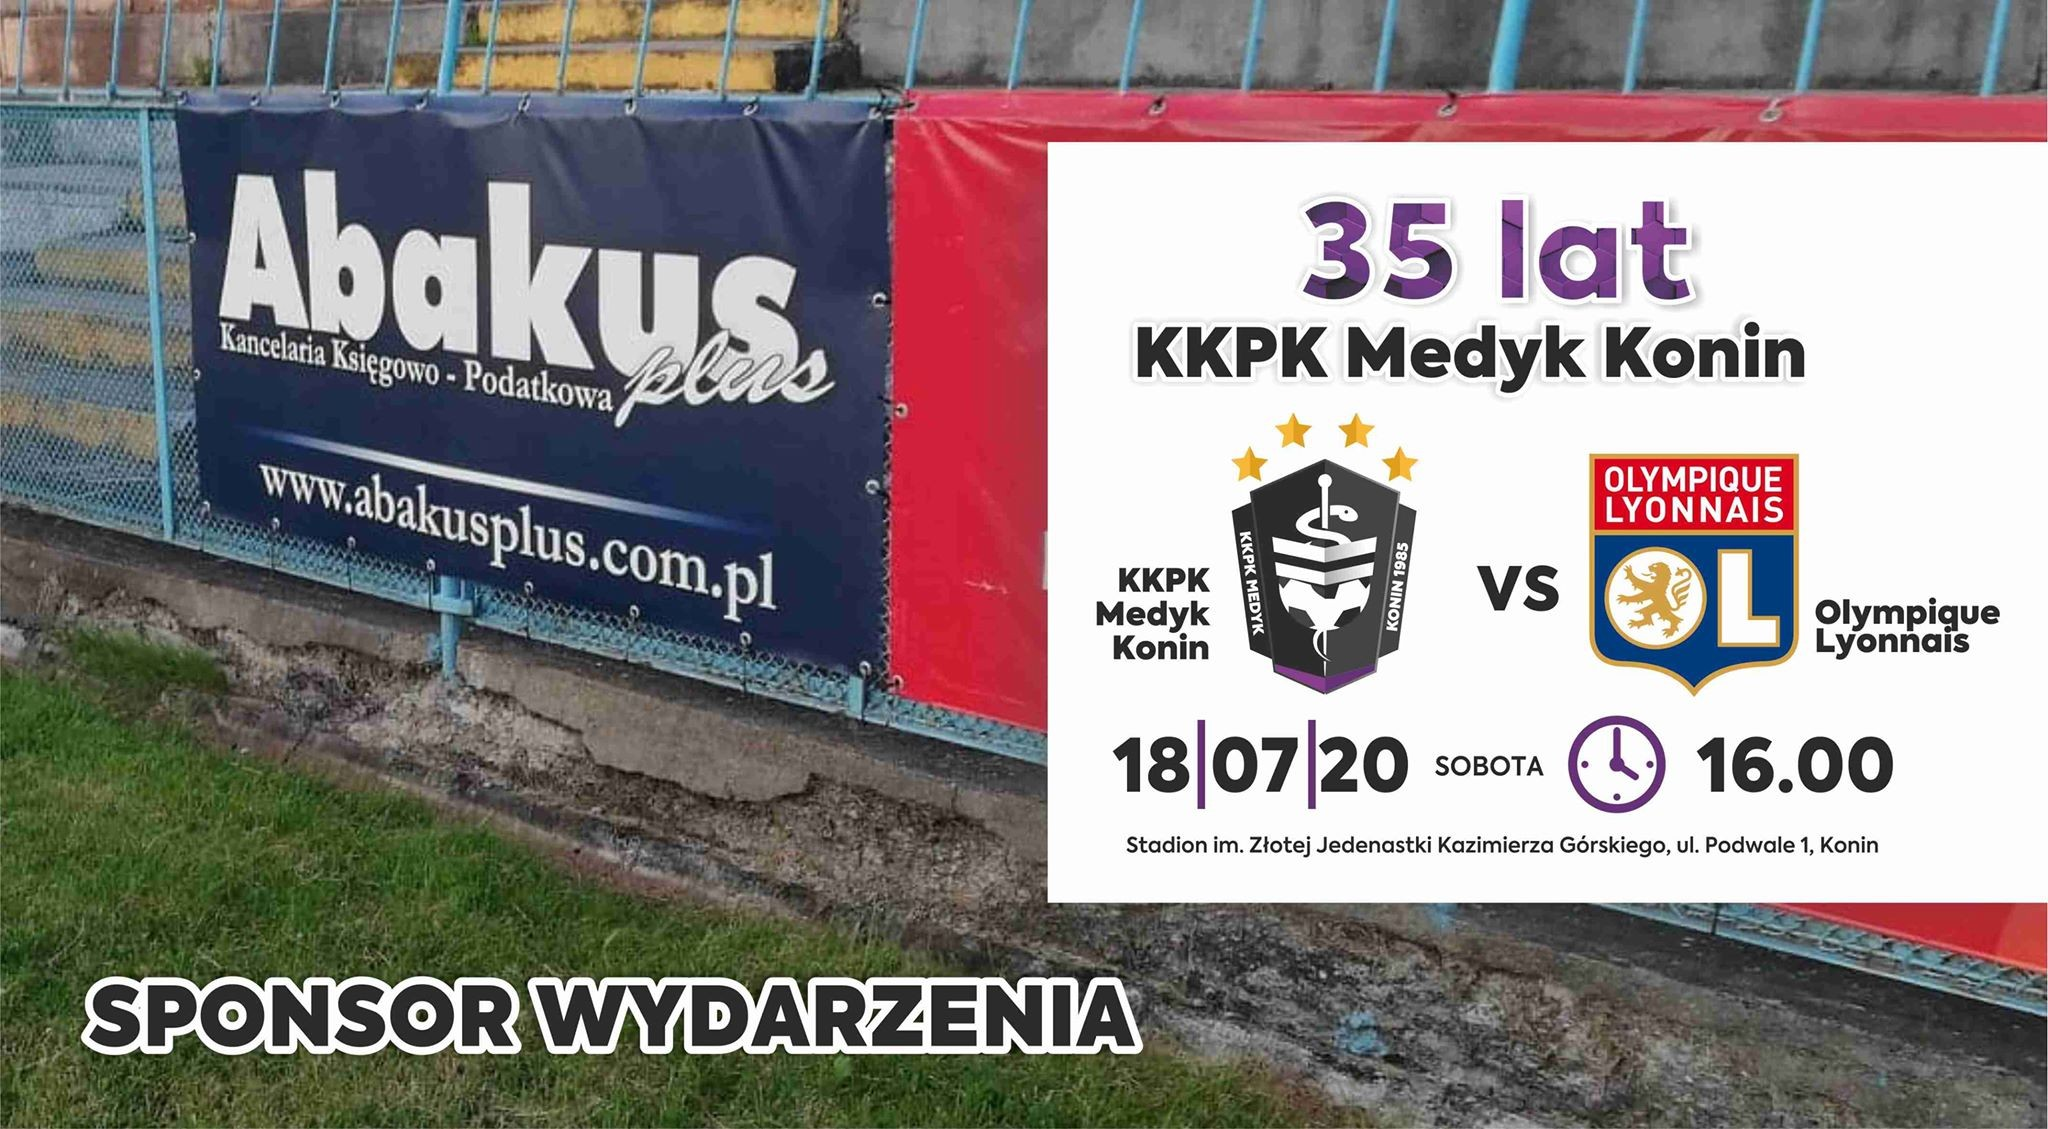 35 lecie KKPK Medyk Konin